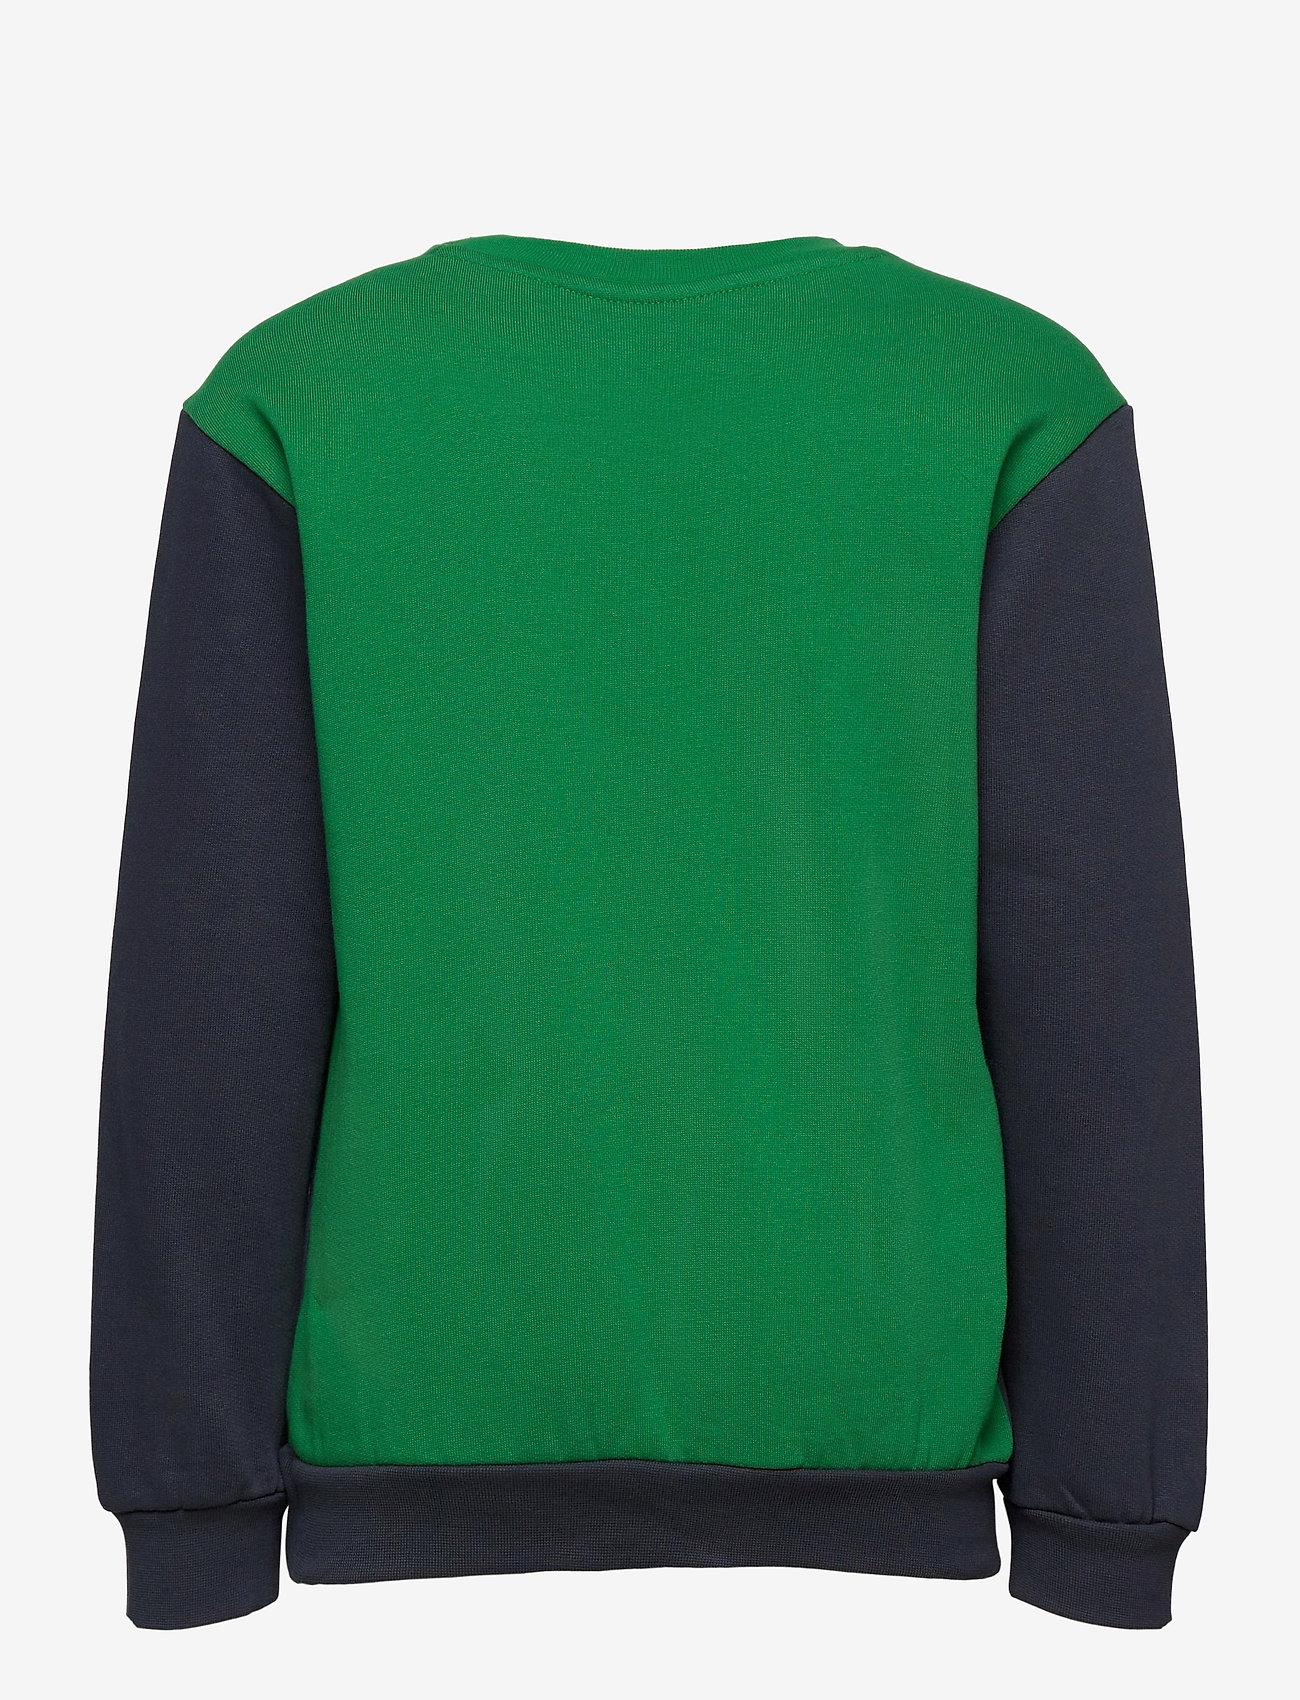 Hummel - hmlLIAM SWEATSHIRT - sweatshirts - blue nights - 1